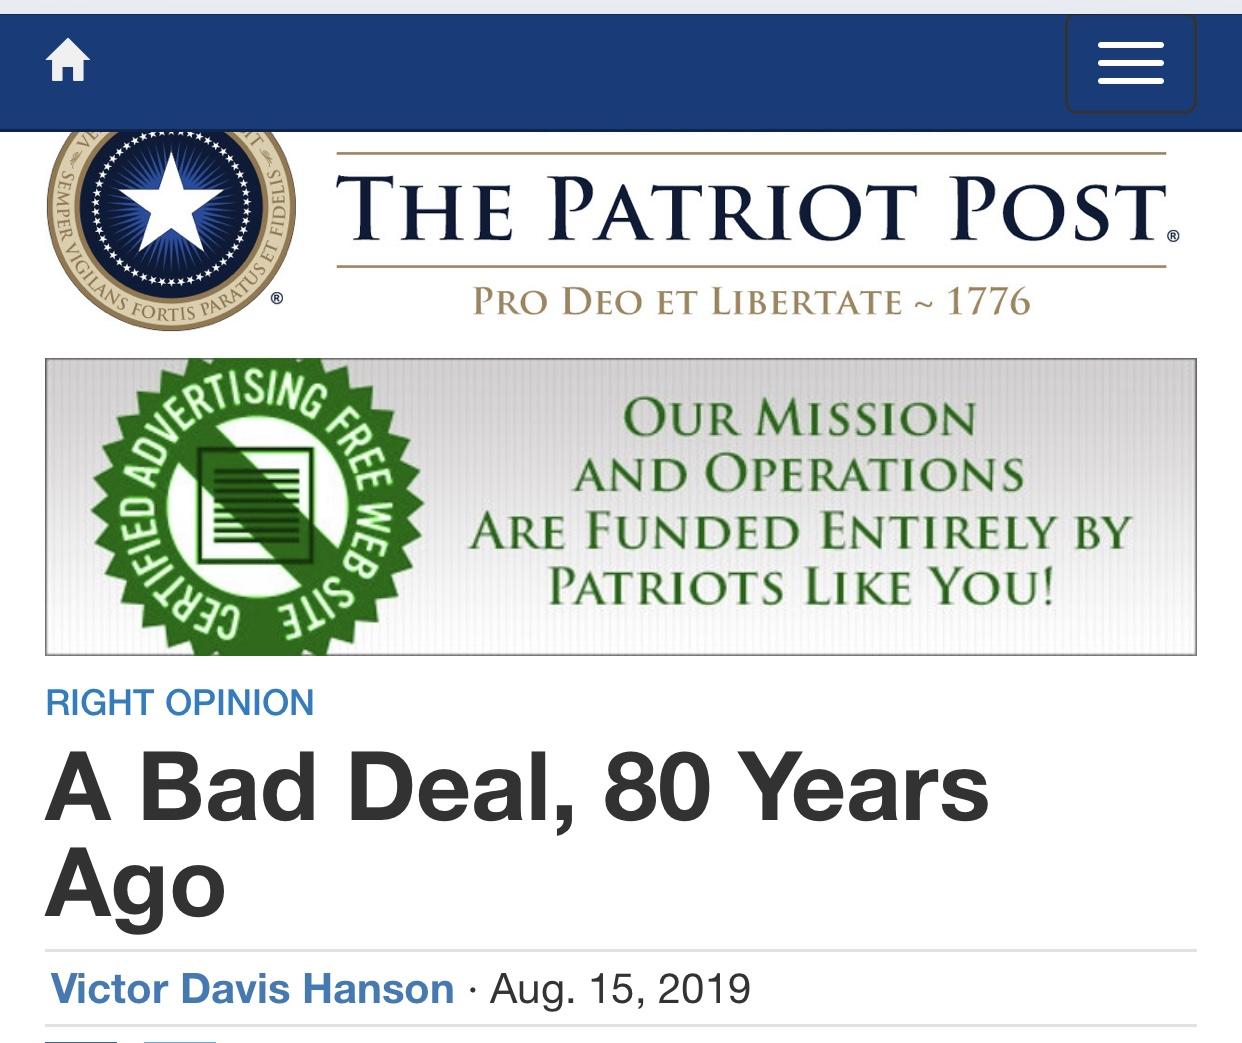 Victor Davis Hanson: A Bad Deal, 80 Years Ago — The Patriot Post